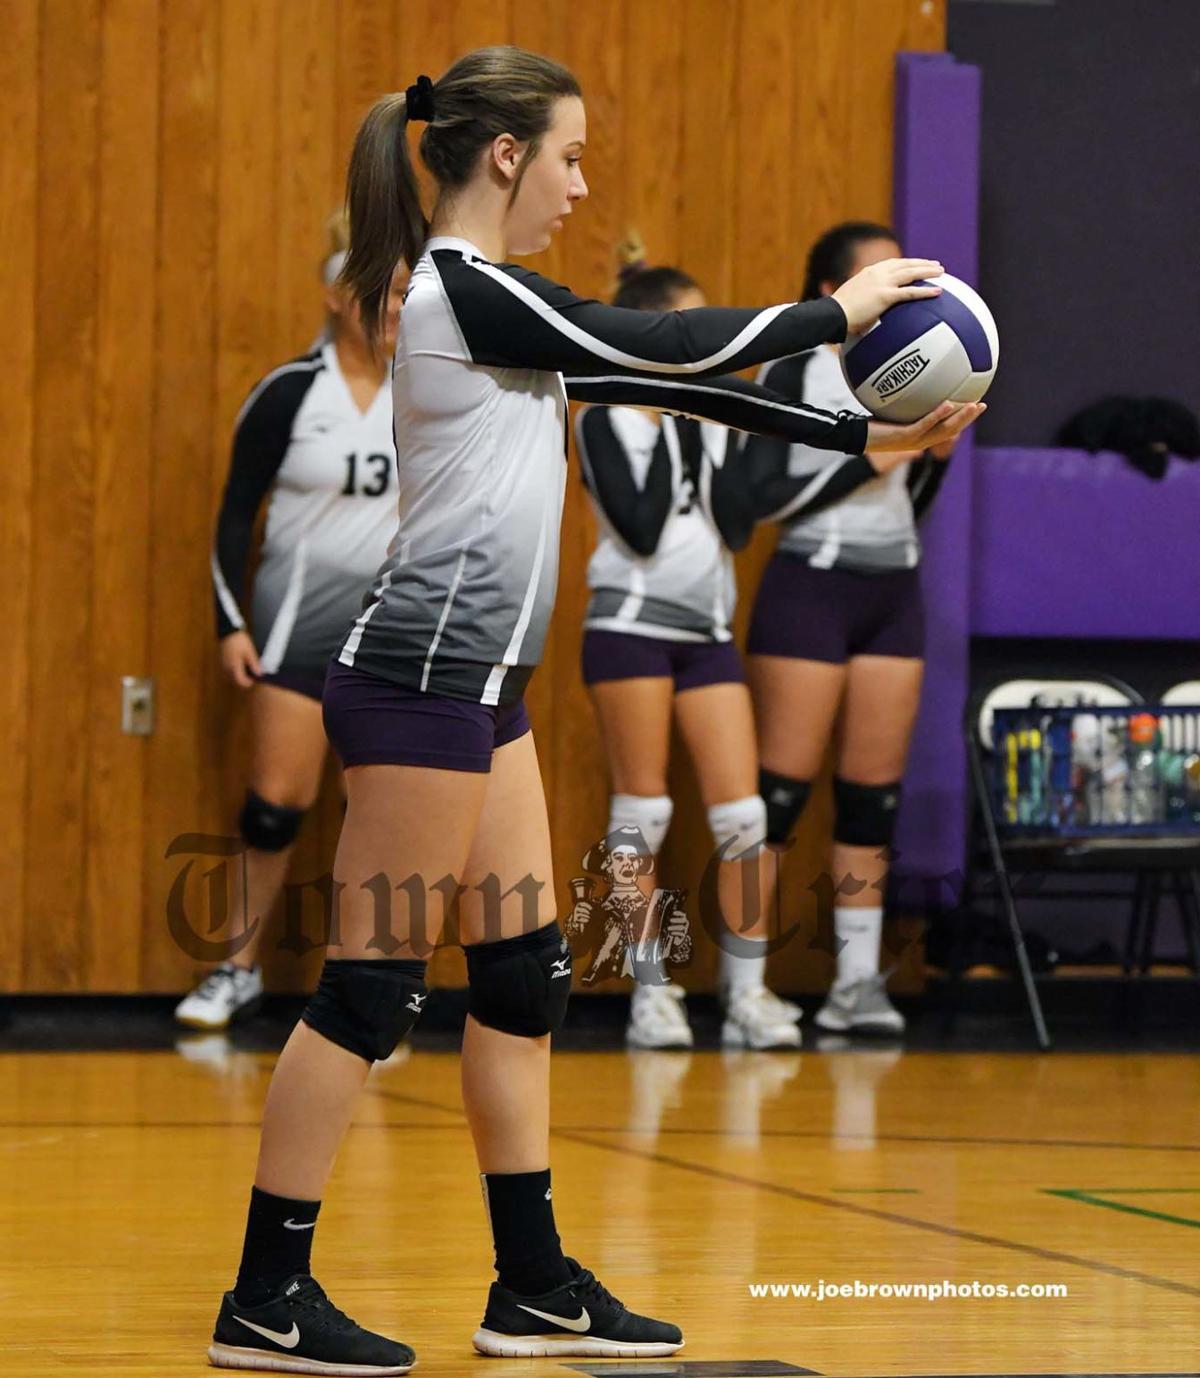 Shawsheen Tech Volleyball player Chloe Gaglione